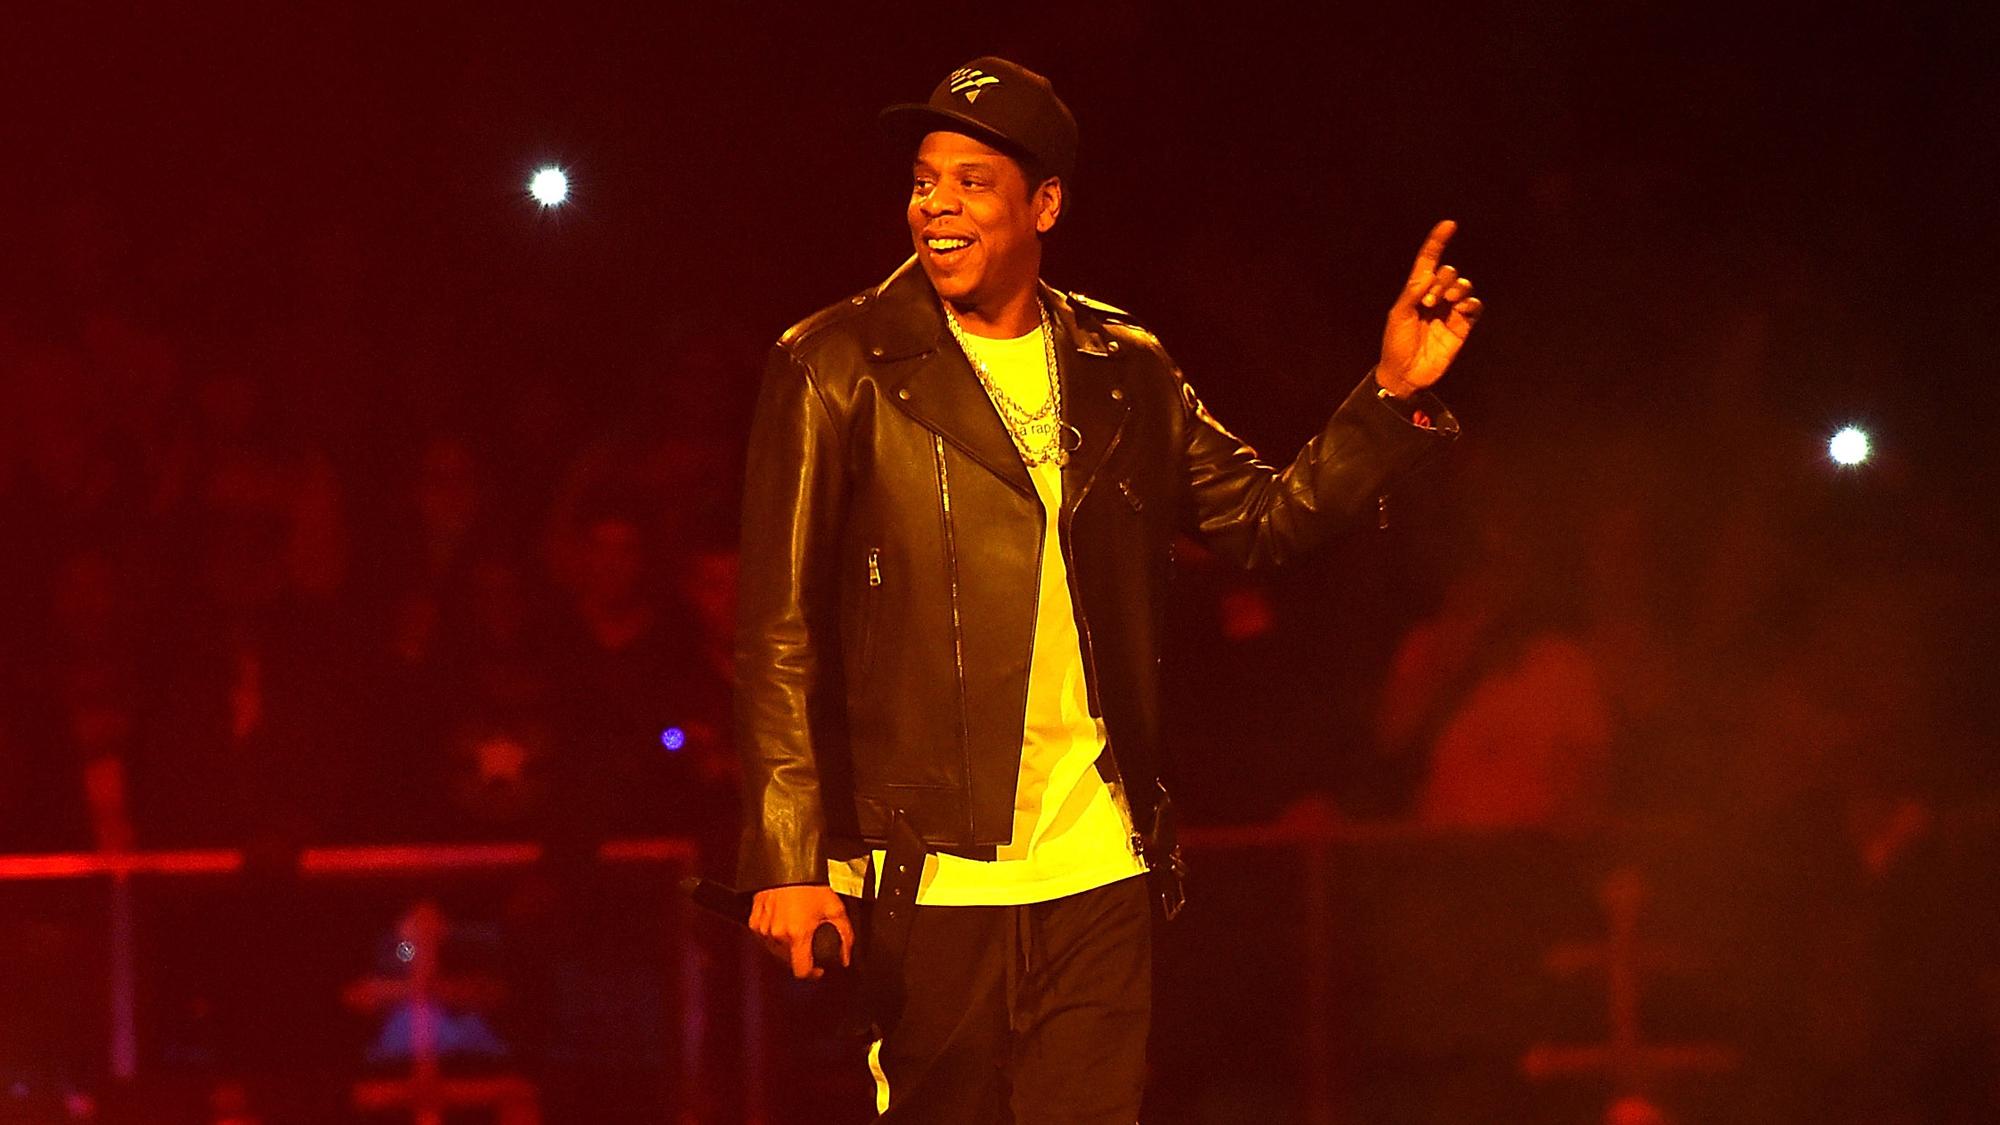 Jay-Z 4:44 Tour – Brooklyn